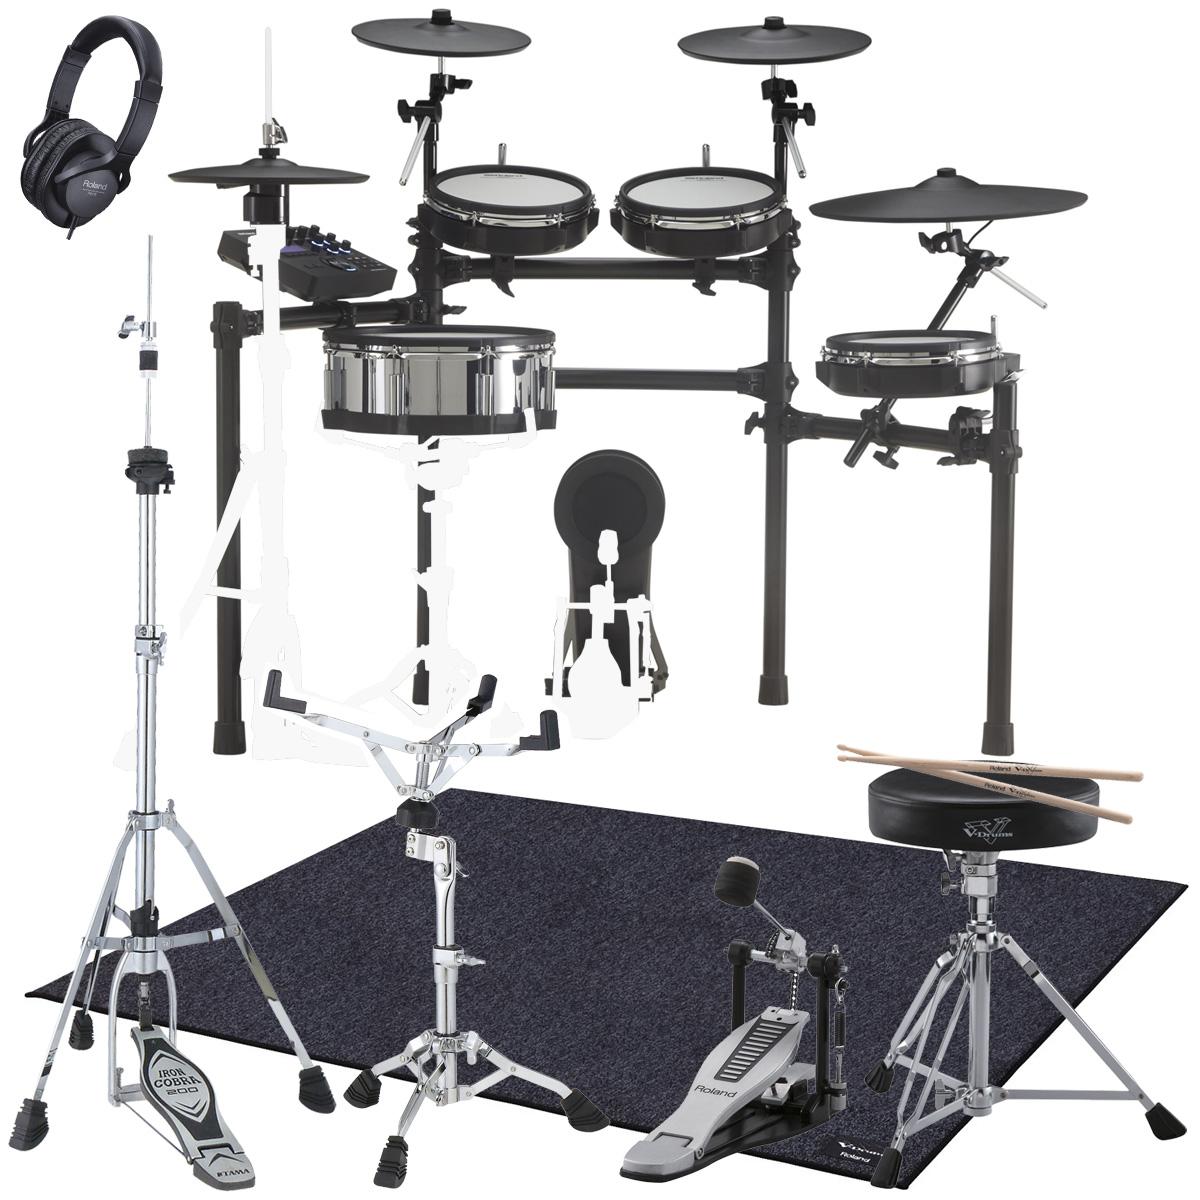 ROLAND / TD-27KV 電子ドラム 推奨ドラムスタンドセット スターターパックDAP/TDM20【YRK】